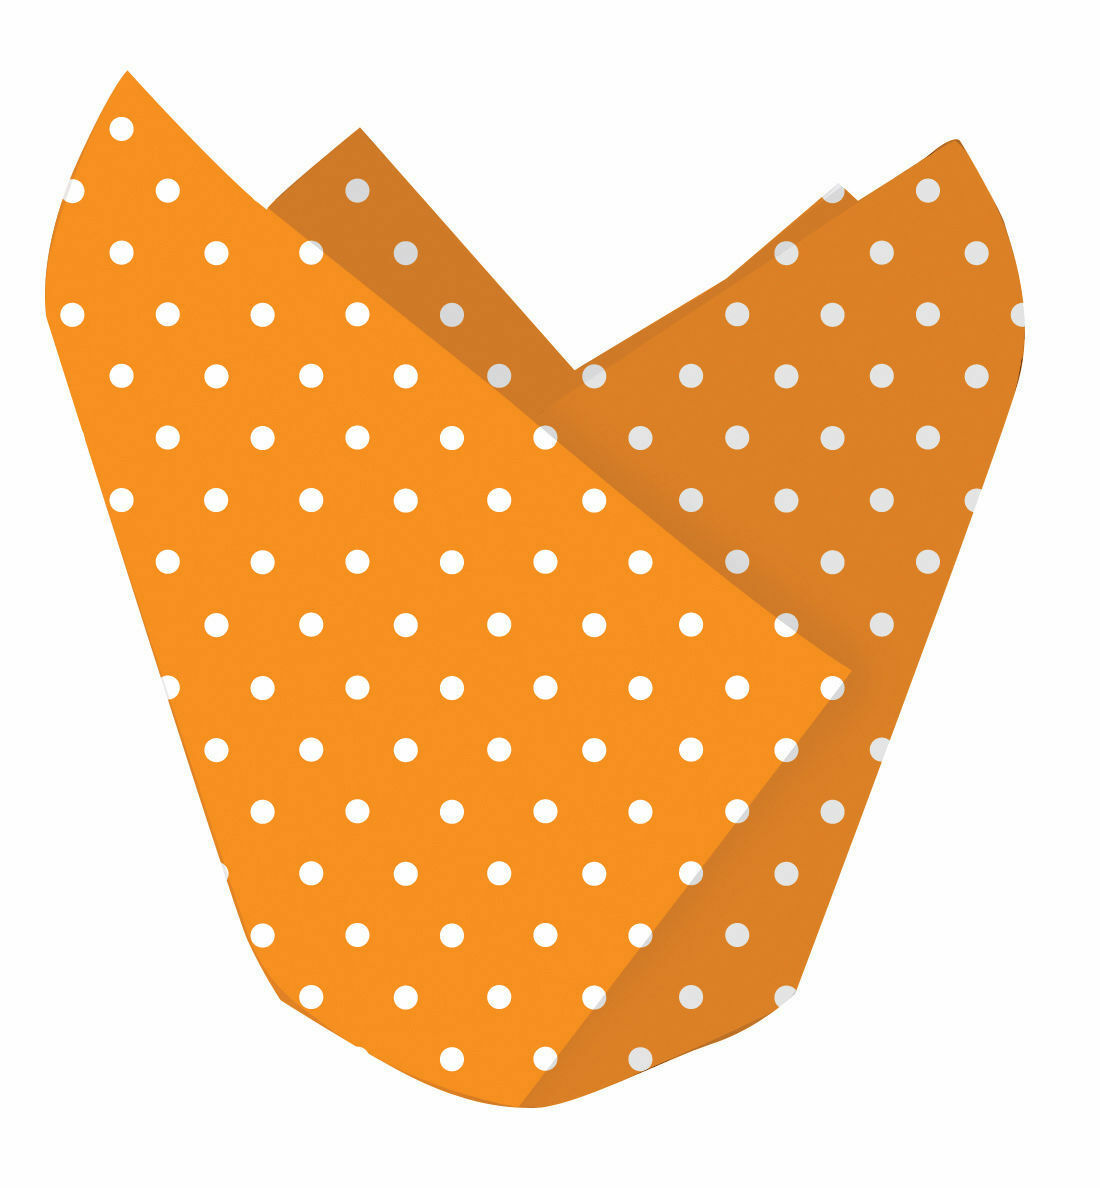 12 X Halloween Cupcake Envoltorios Fundas Decorativo Naranja Lunares